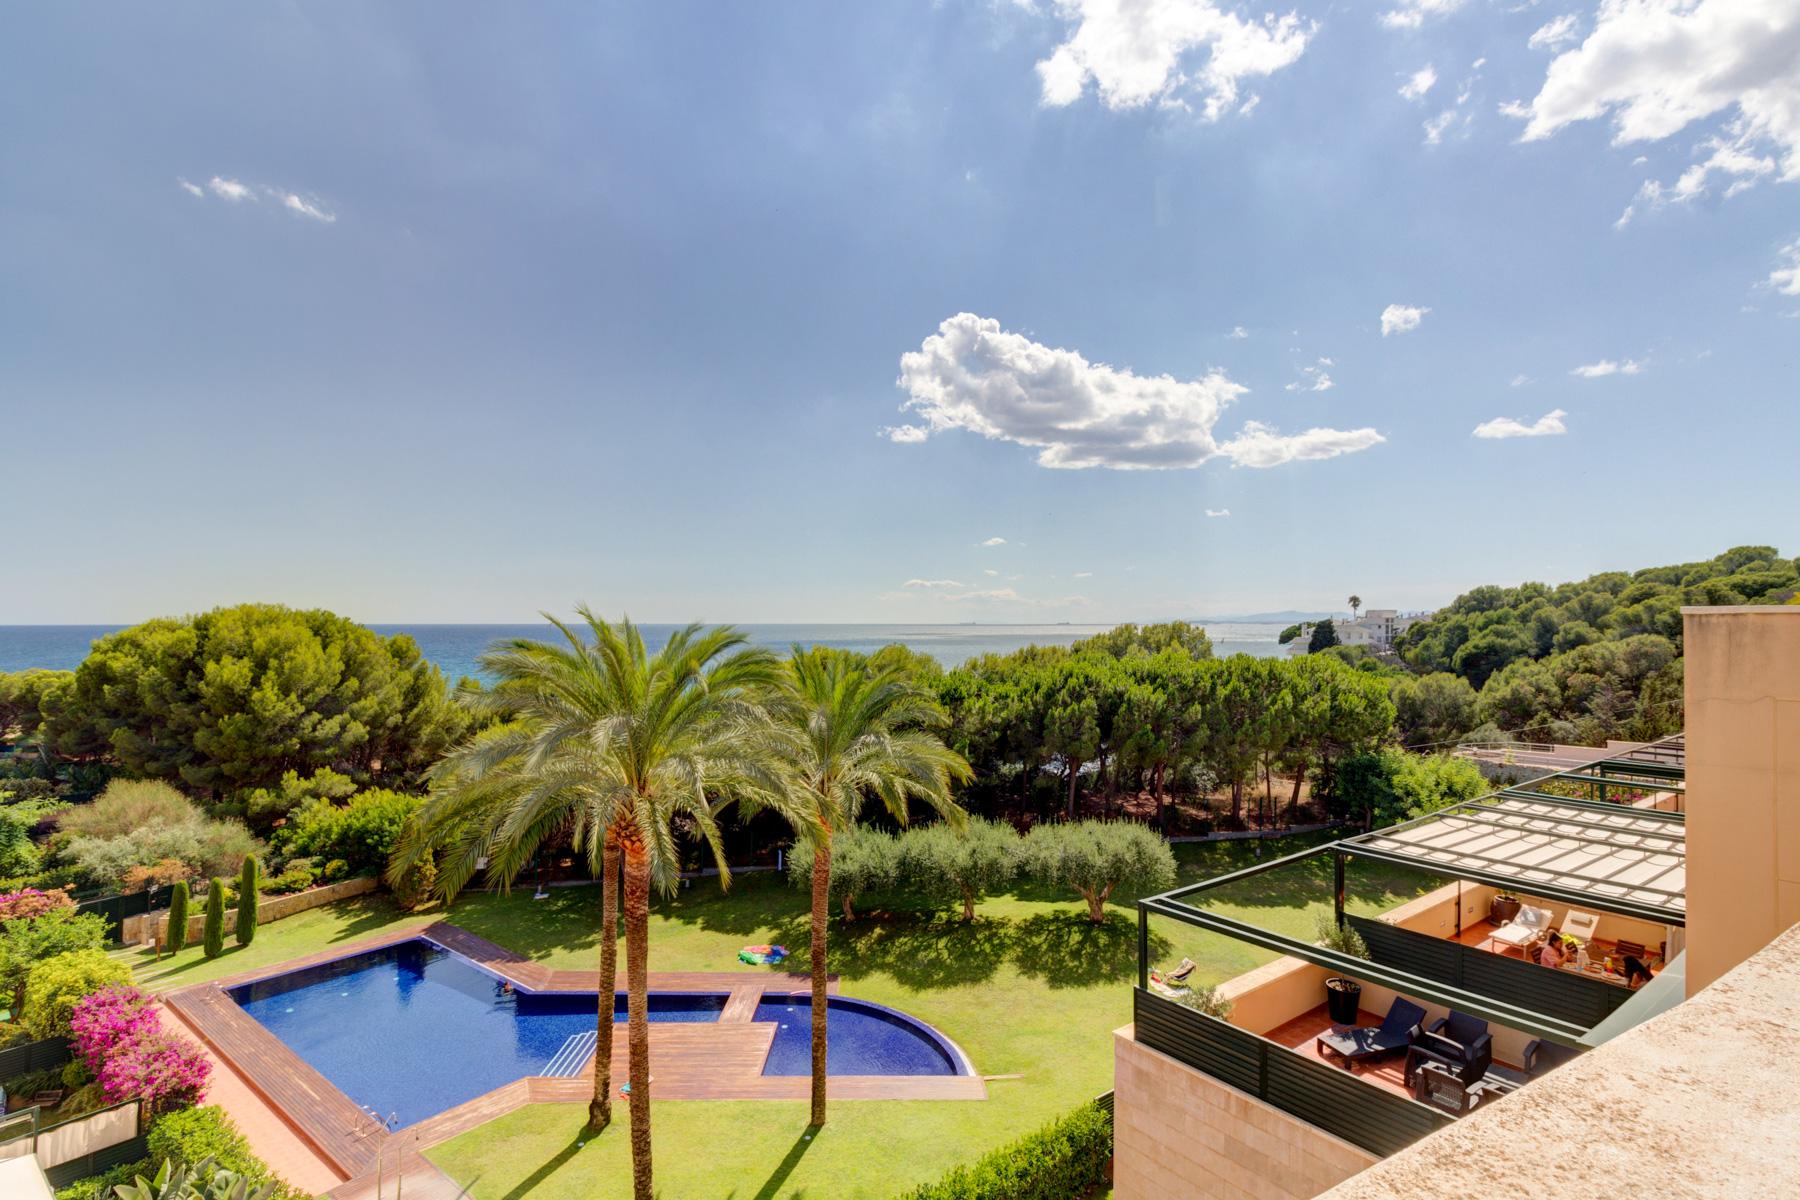 Duplex penthouse for sale in Tarragona